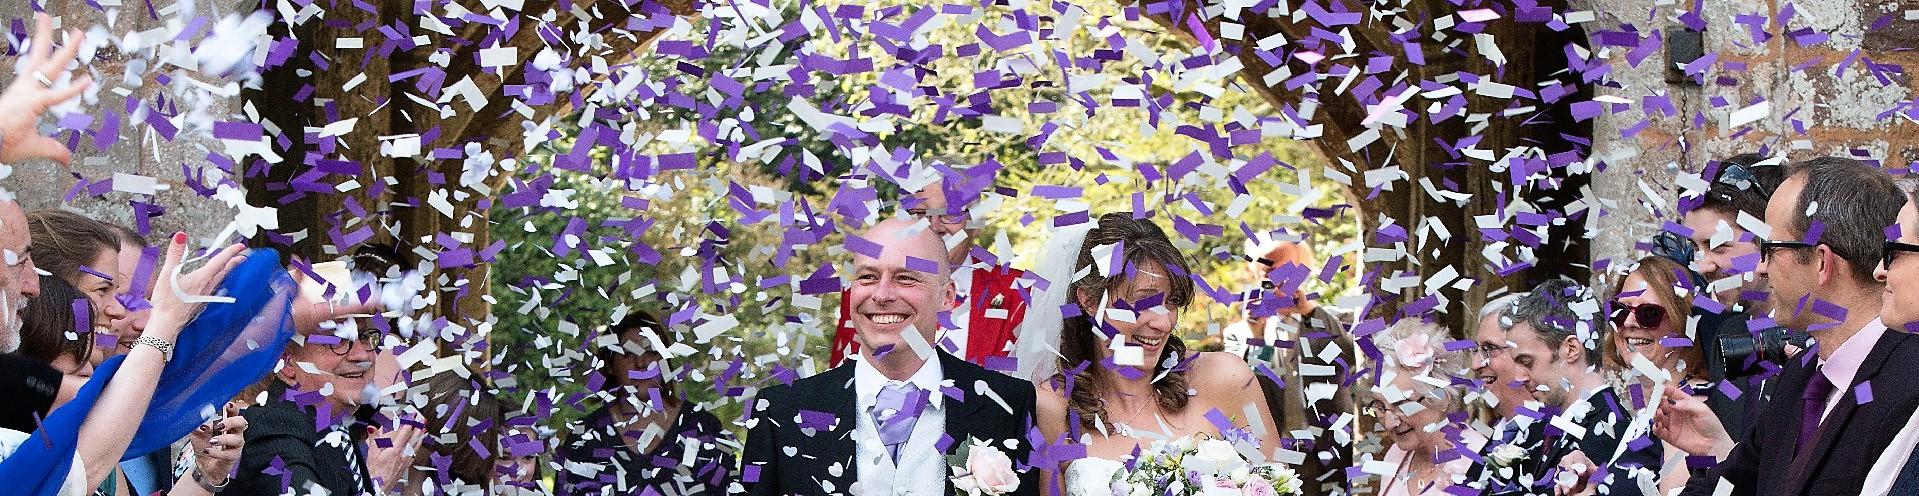 wedding confetti cannons shoot confetti over bride and groom